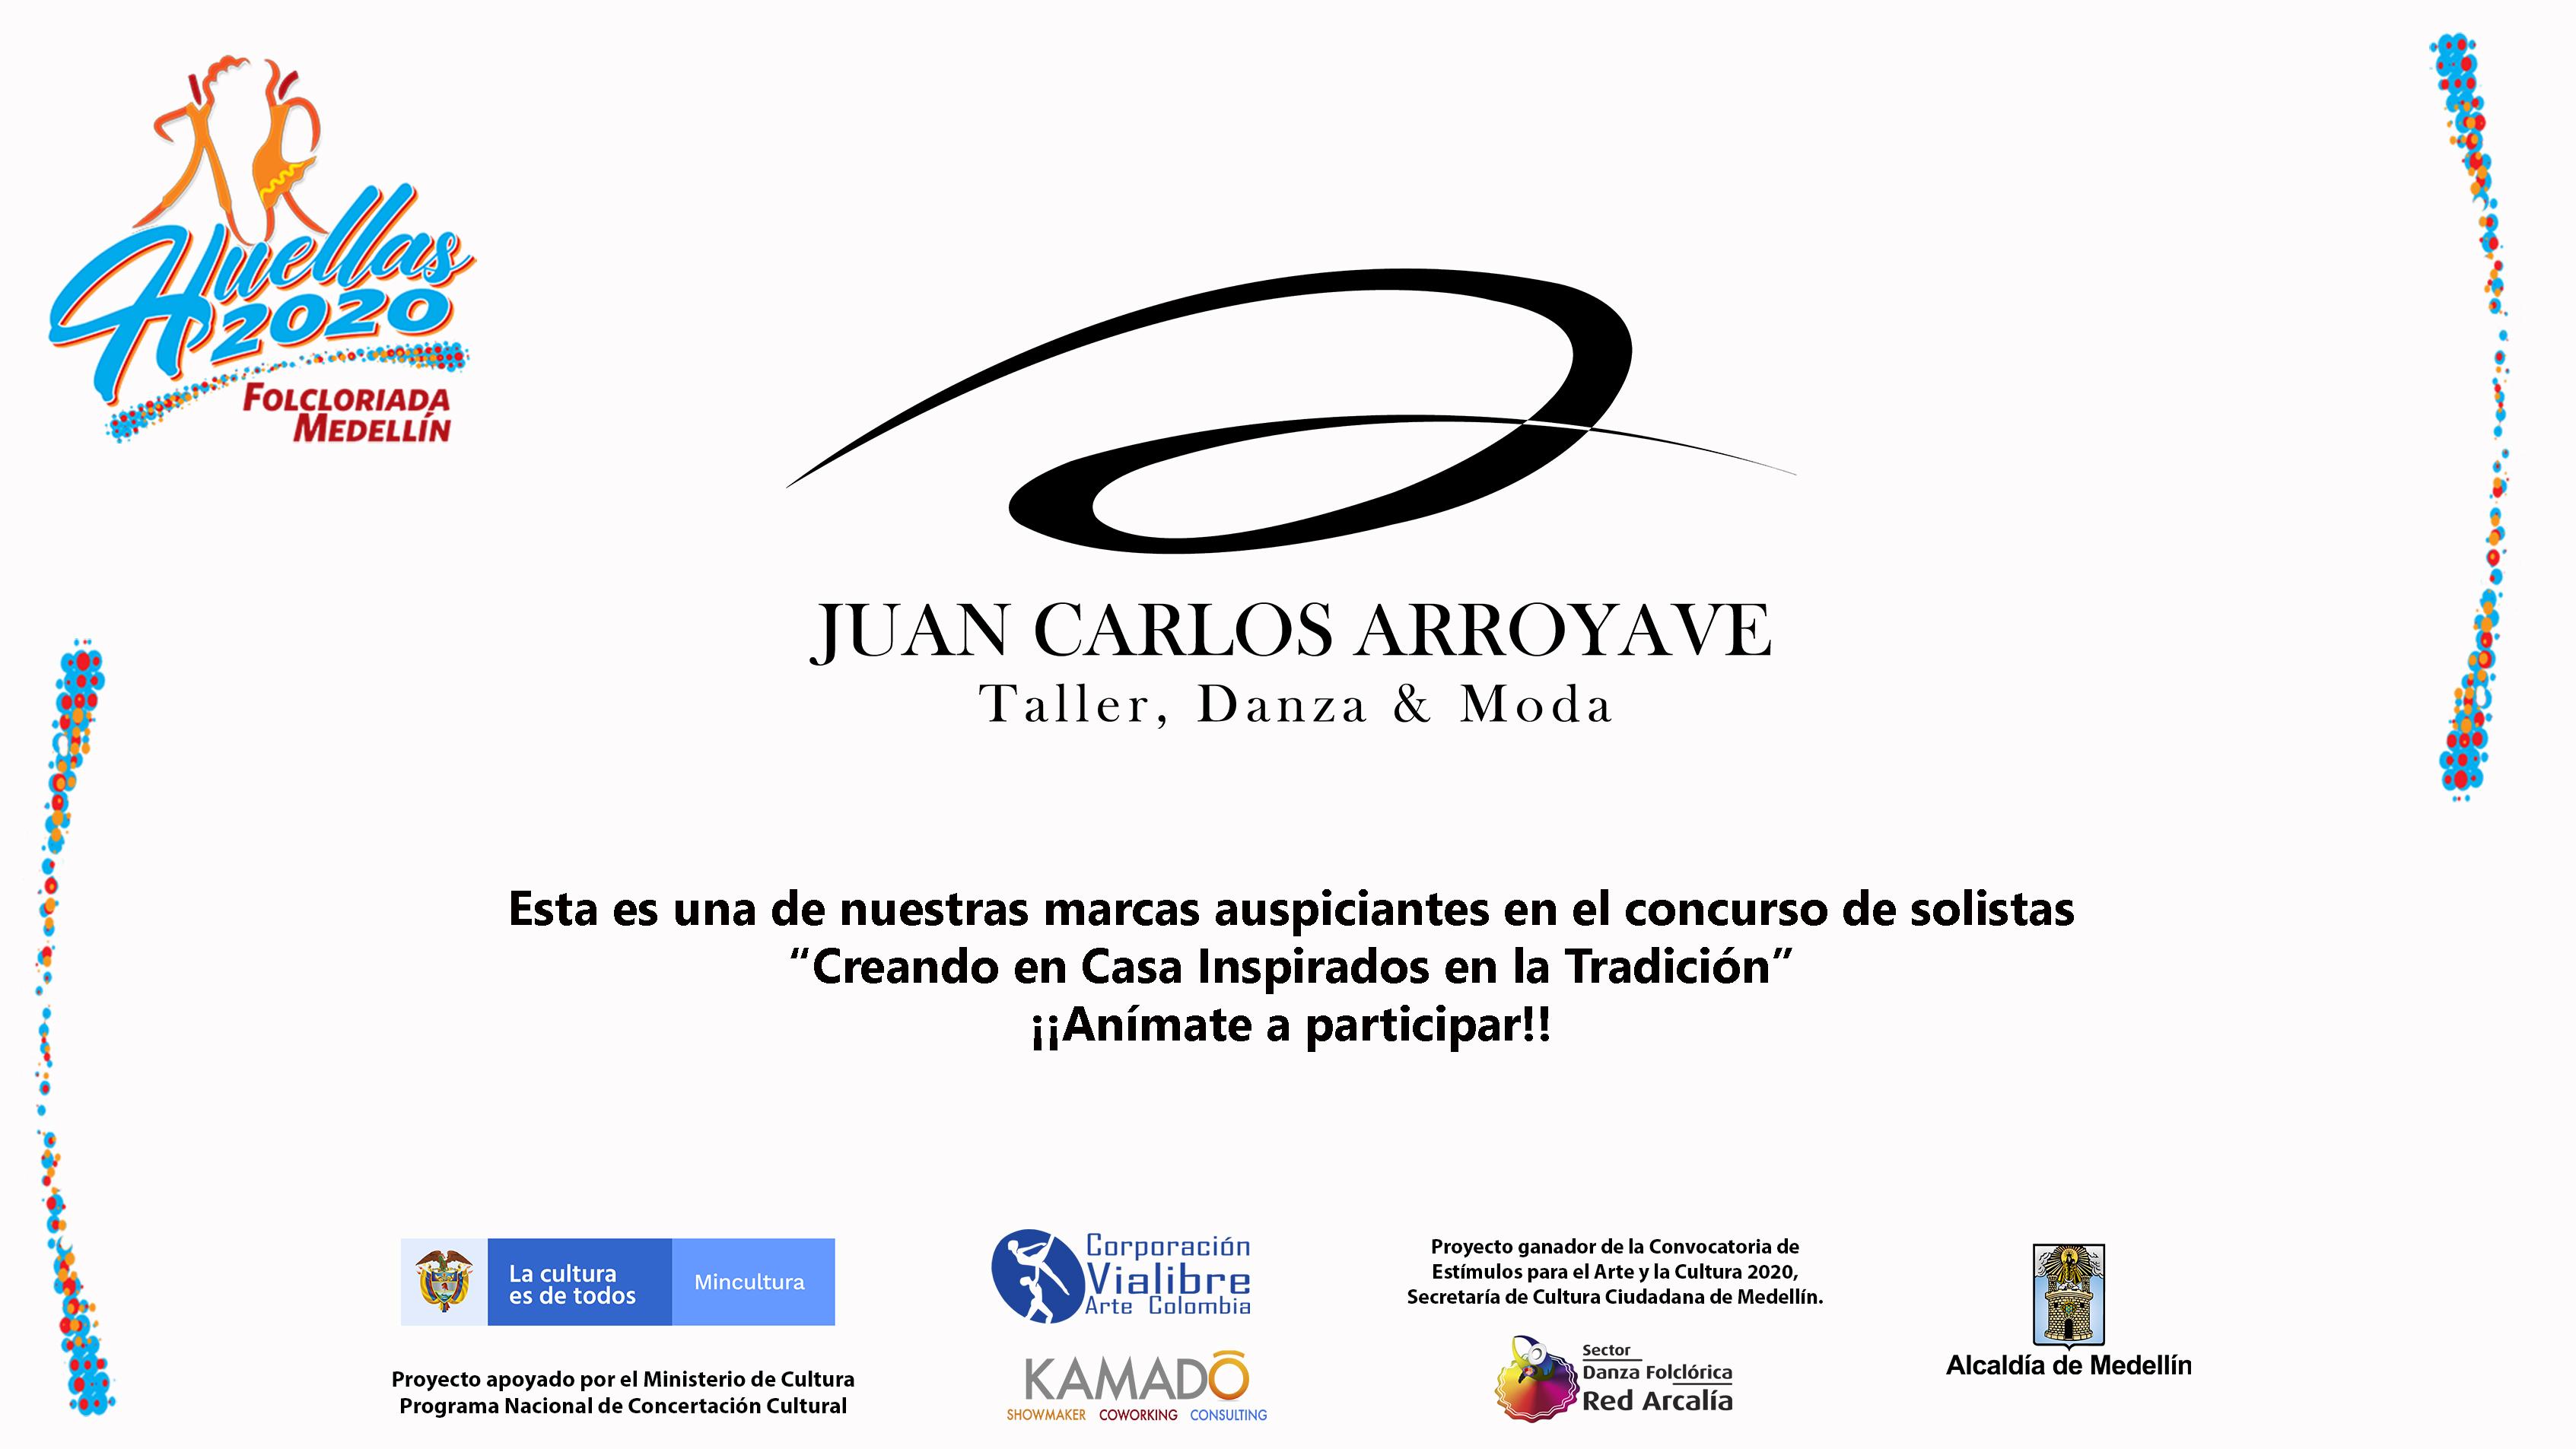 Juan Carlos Arroyave